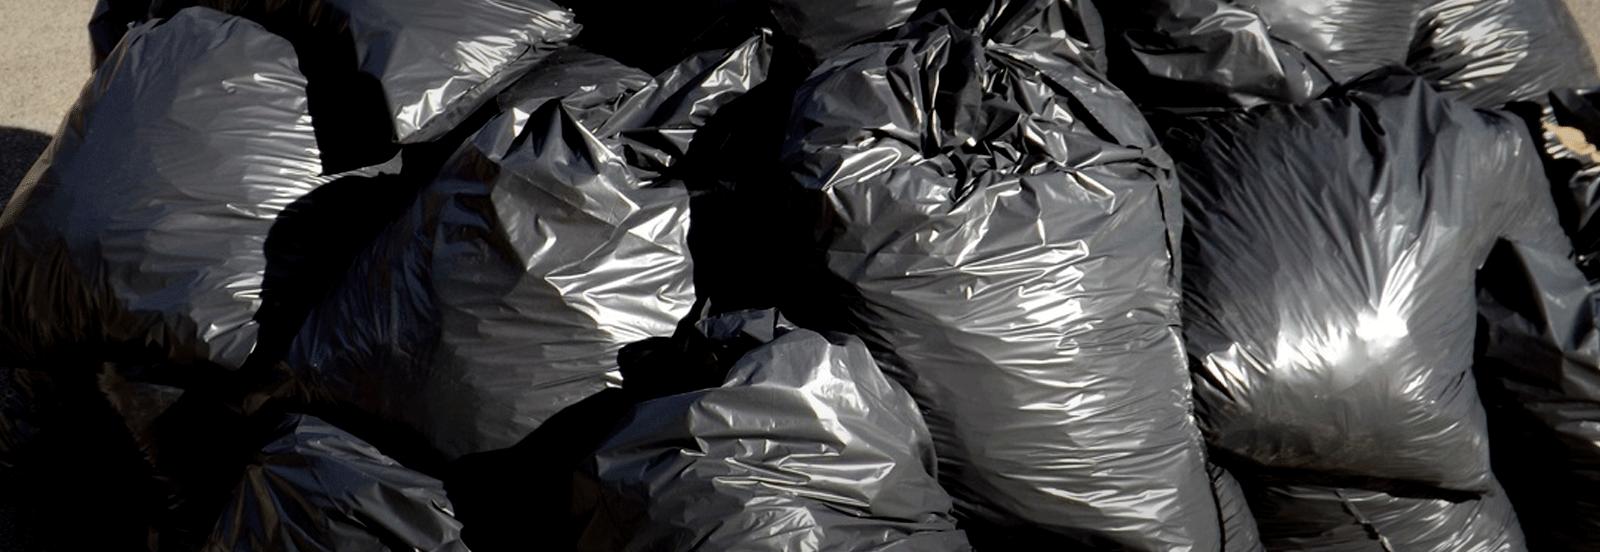 Bin bags and black rubbish sacks